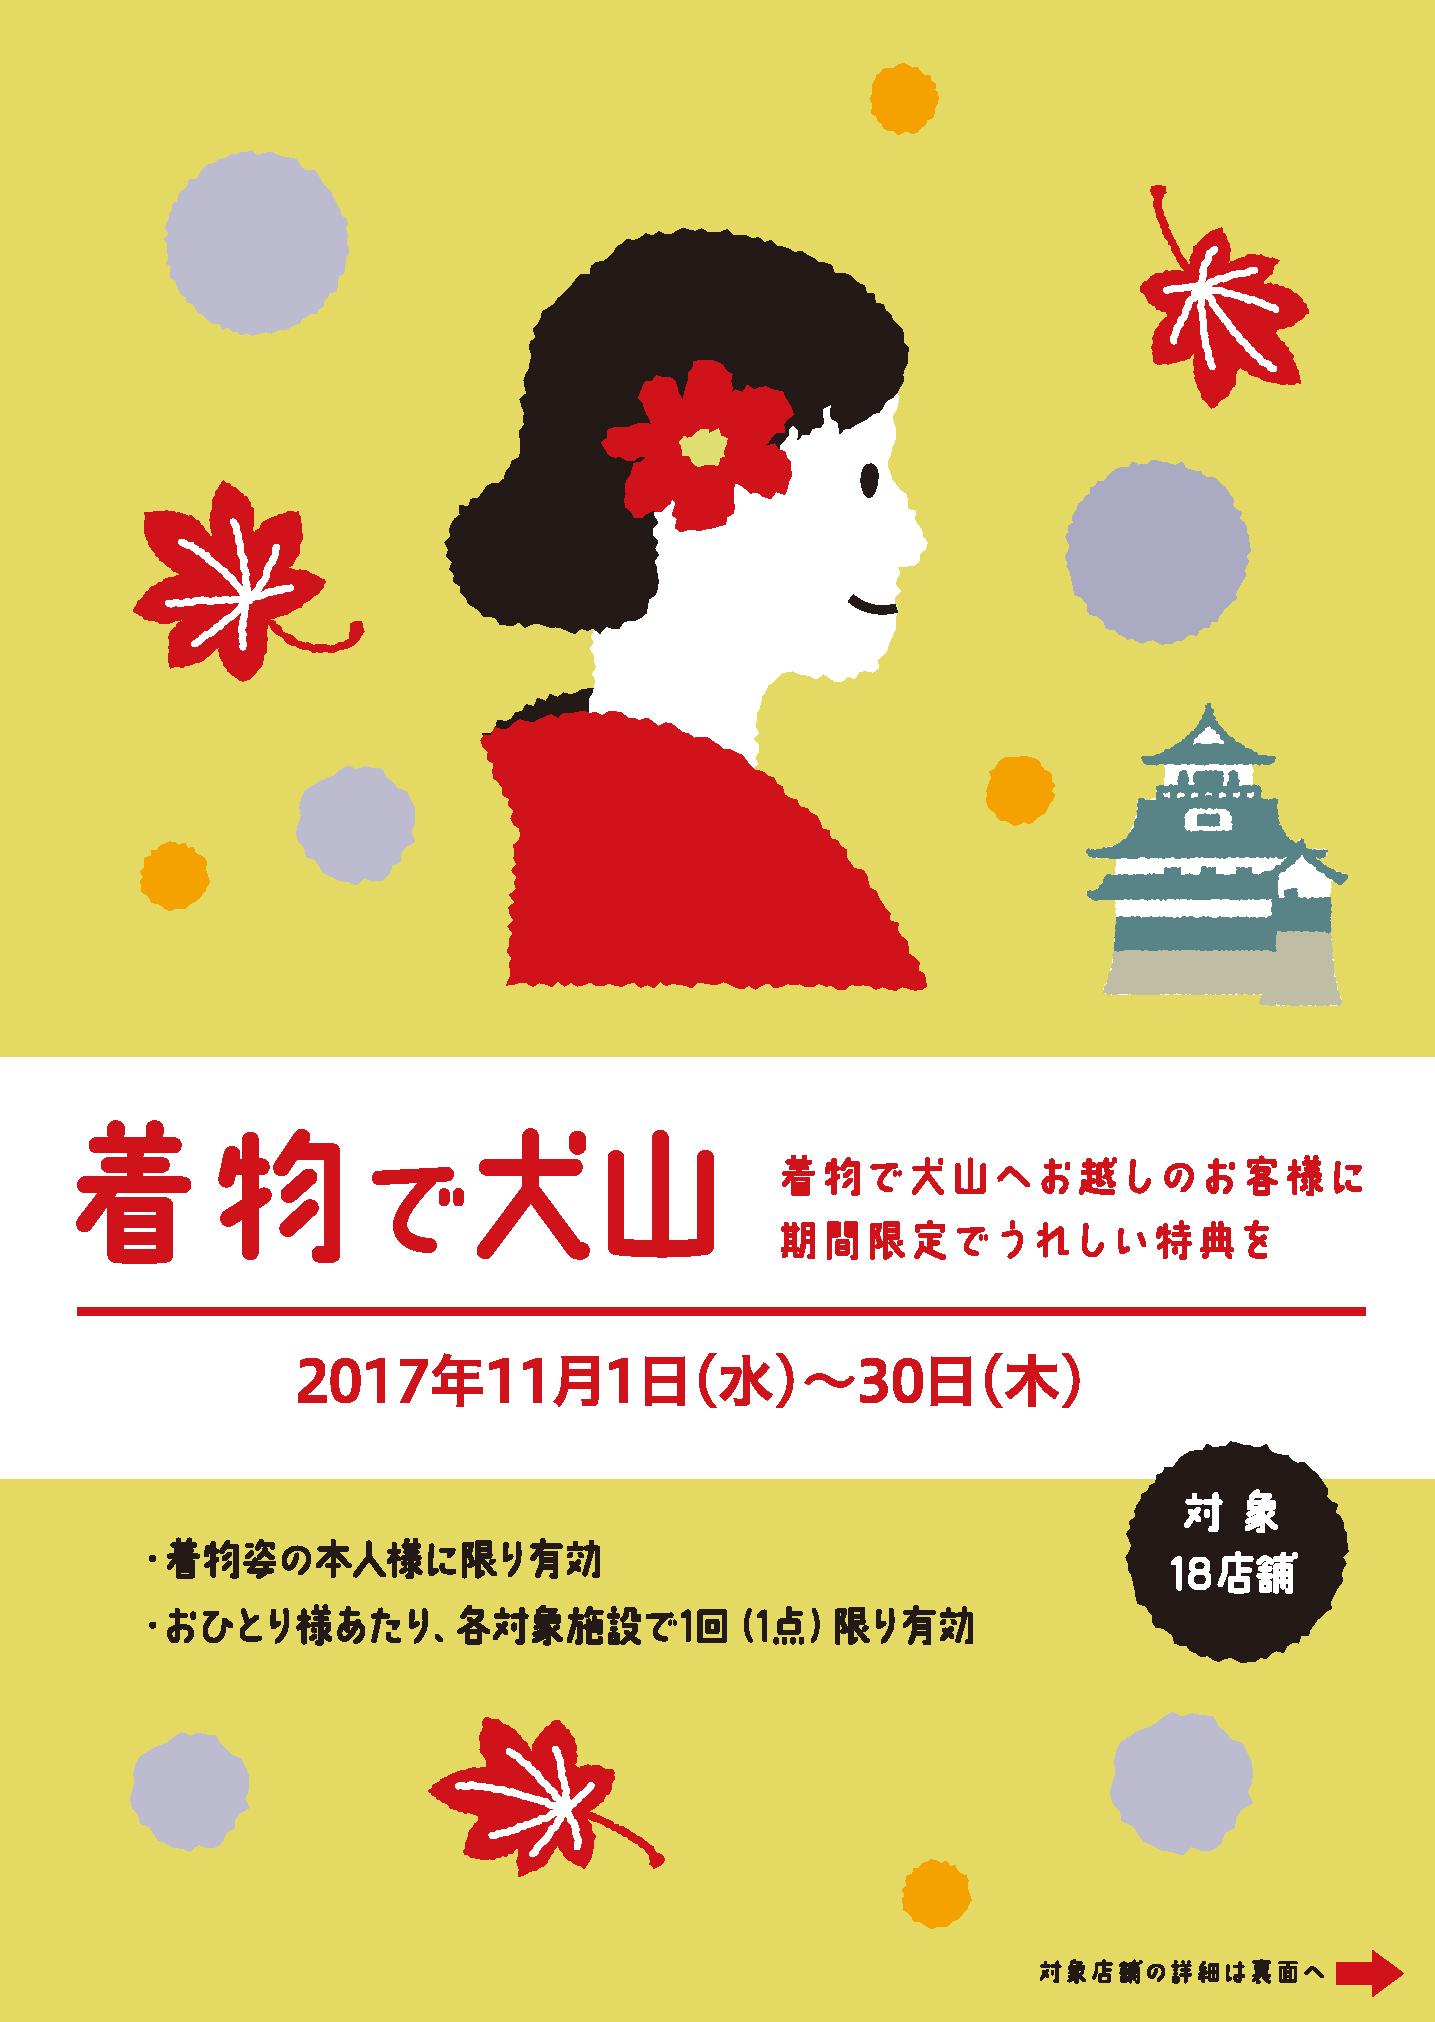 kimono_tokuten_ol_20171026trim_1